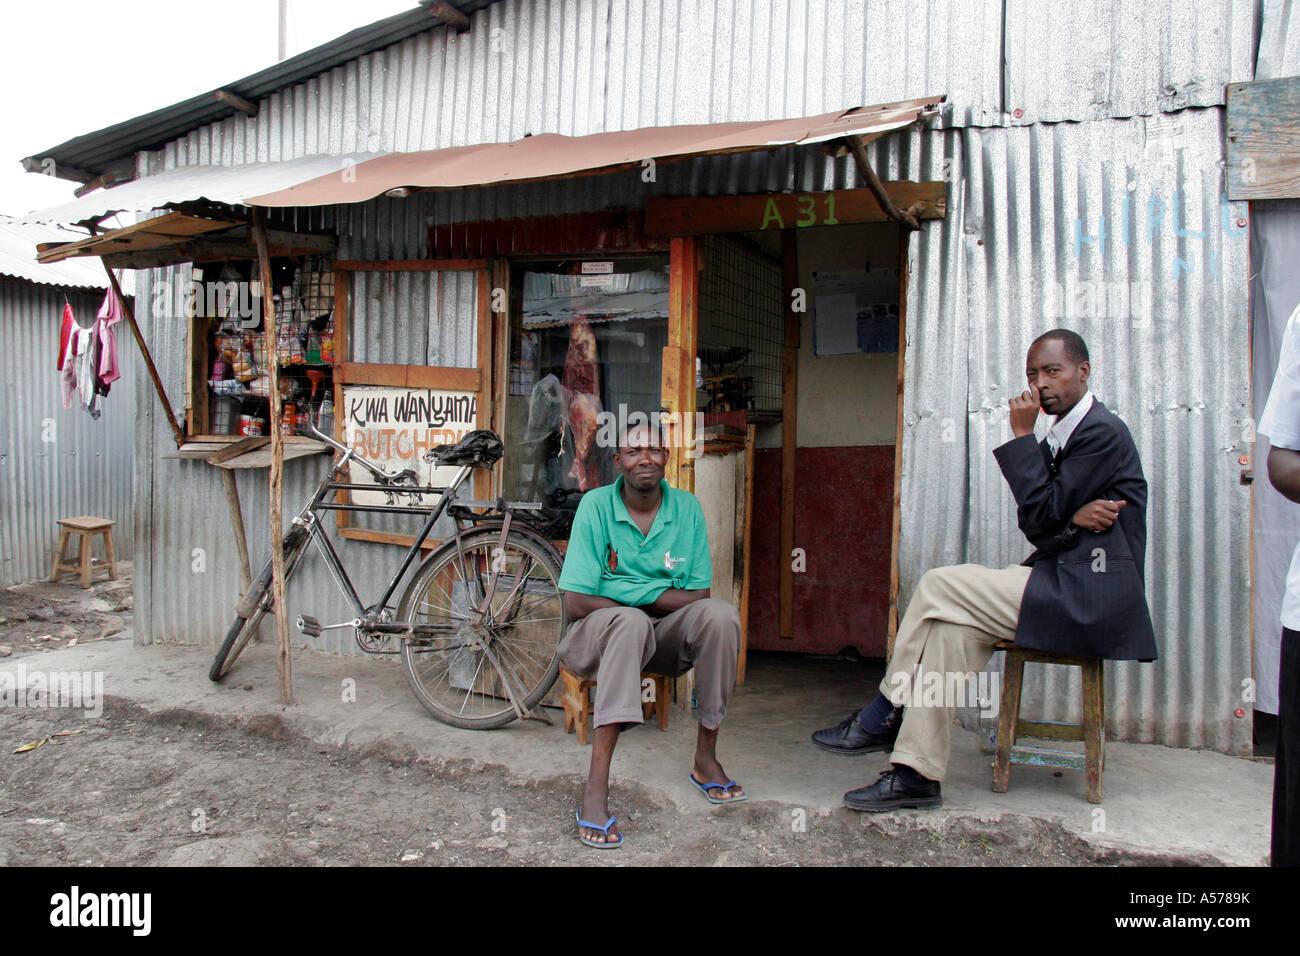 painet kenya mukuru nairobi mombasa stockfotos painet kenya mukuru nairobi mombasa bilder alamy. Black Bedroom Furniture Sets. Home Design Ideas